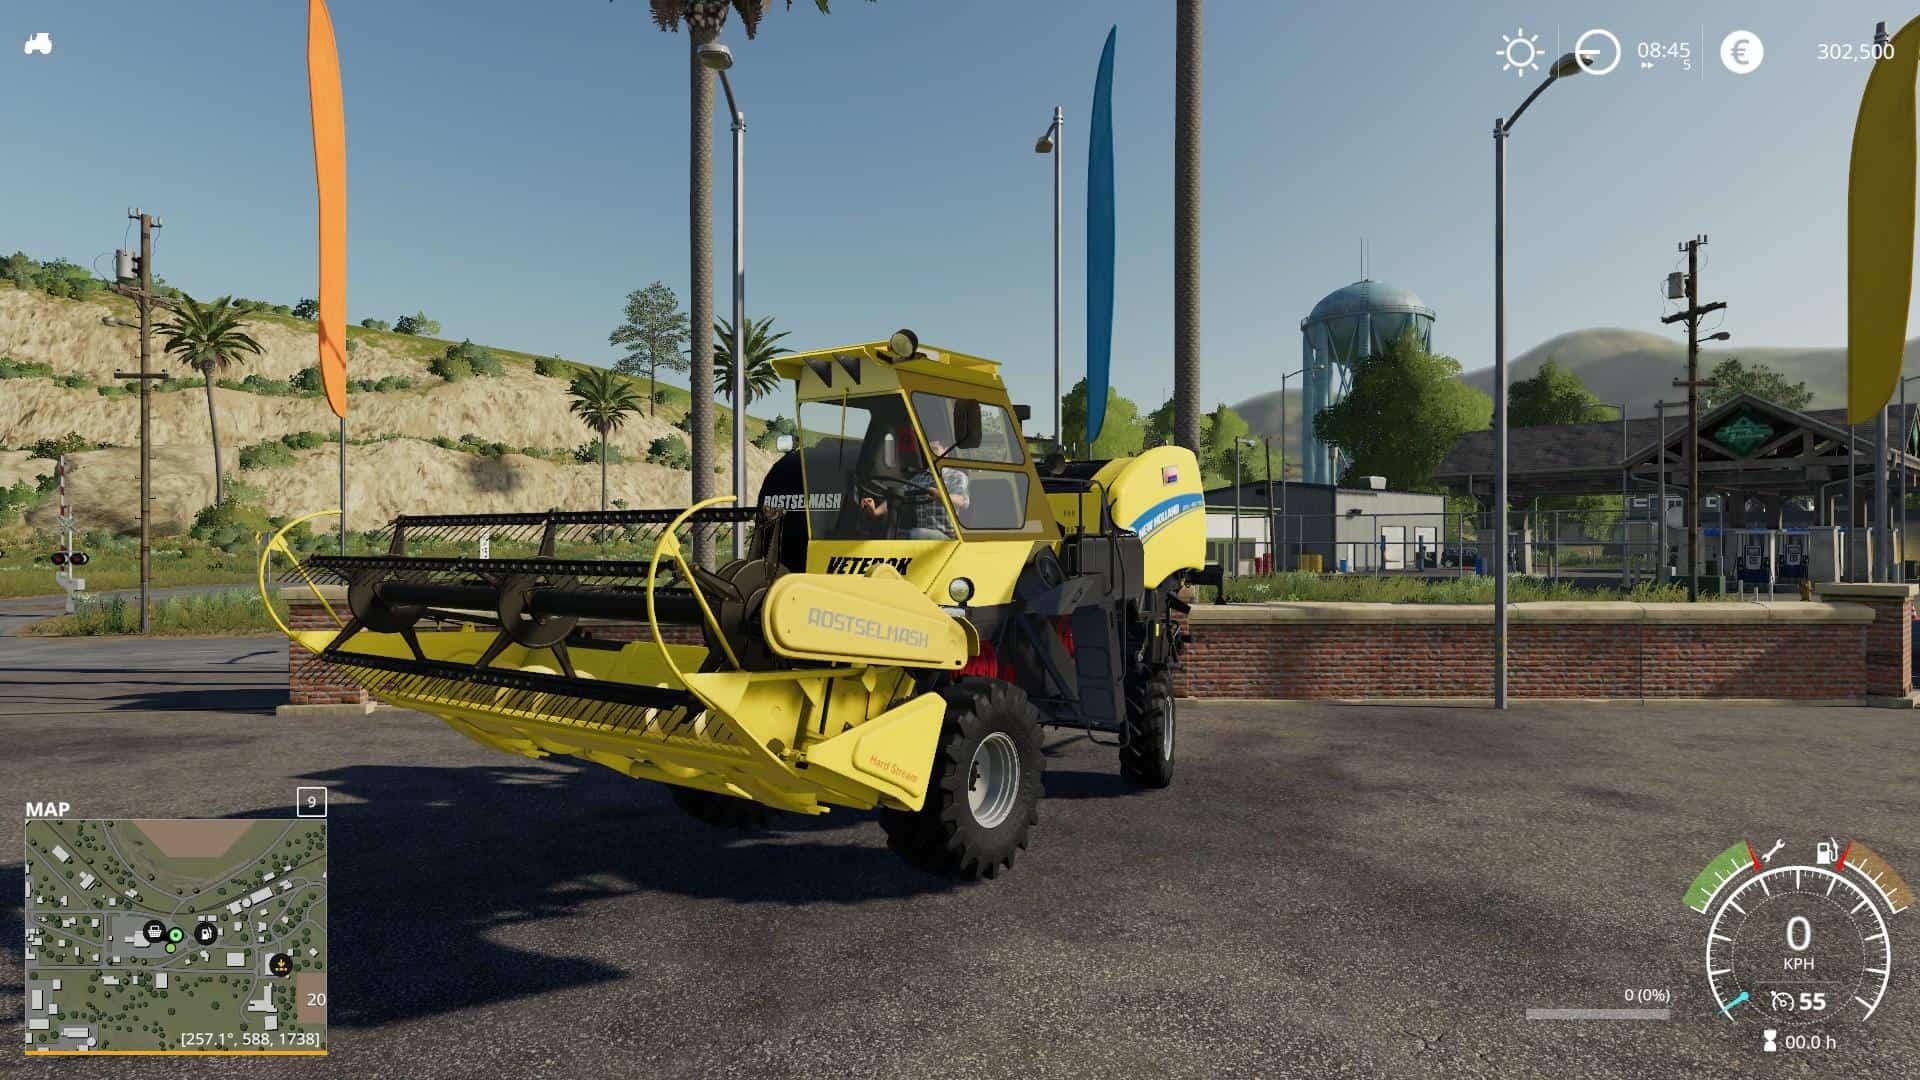 rostselmash new holland round cotton bale v1 0 0 0 mod farming simulator 19 mod fs19